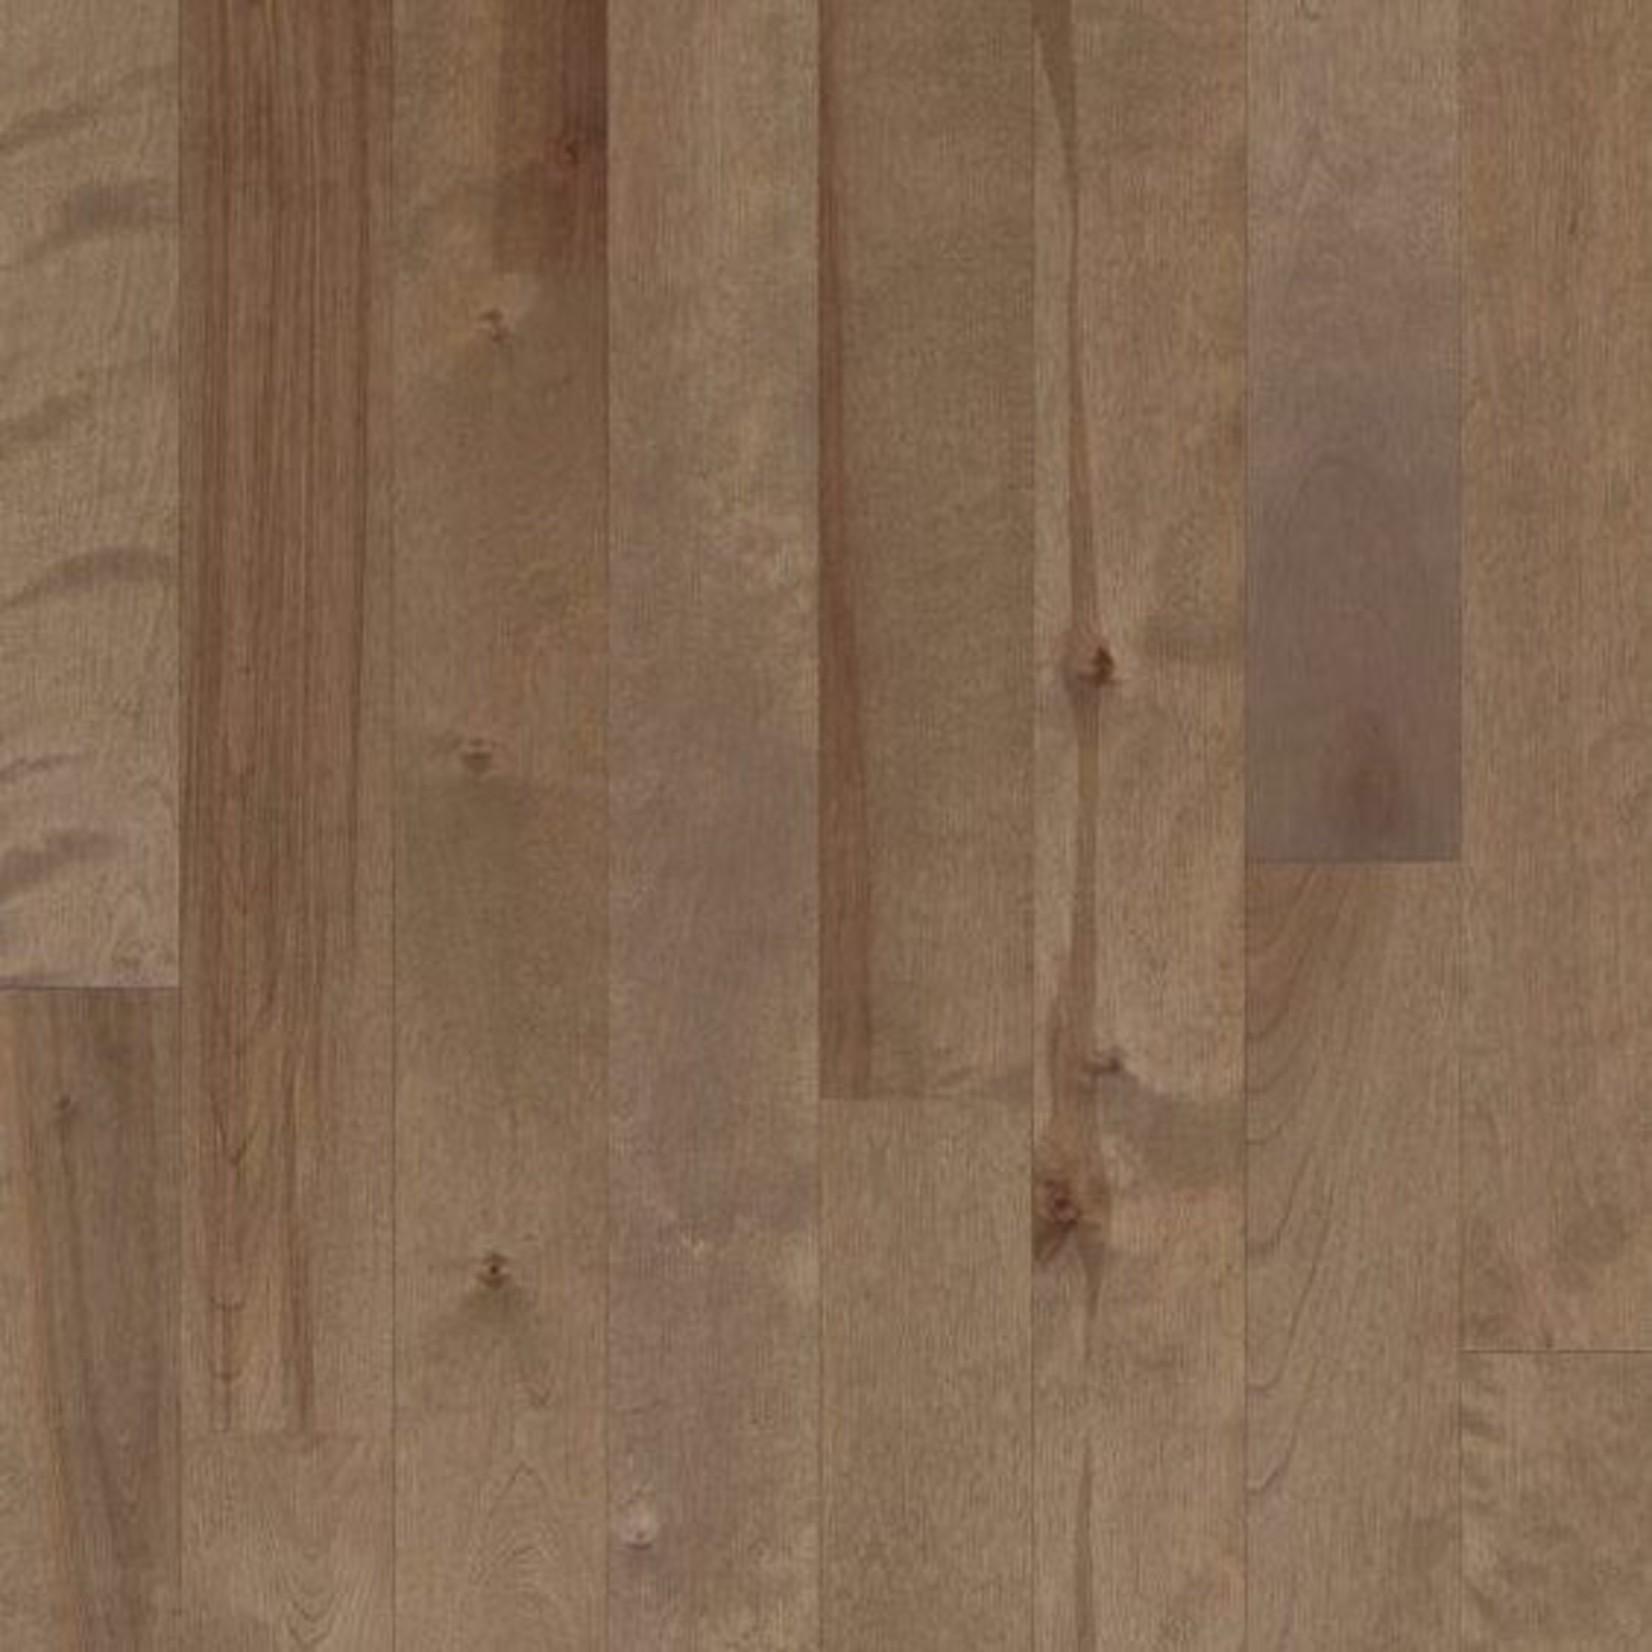 Dubeau Planchers Dubeau - Plancher Merisier variation verni ultra-mat 10%